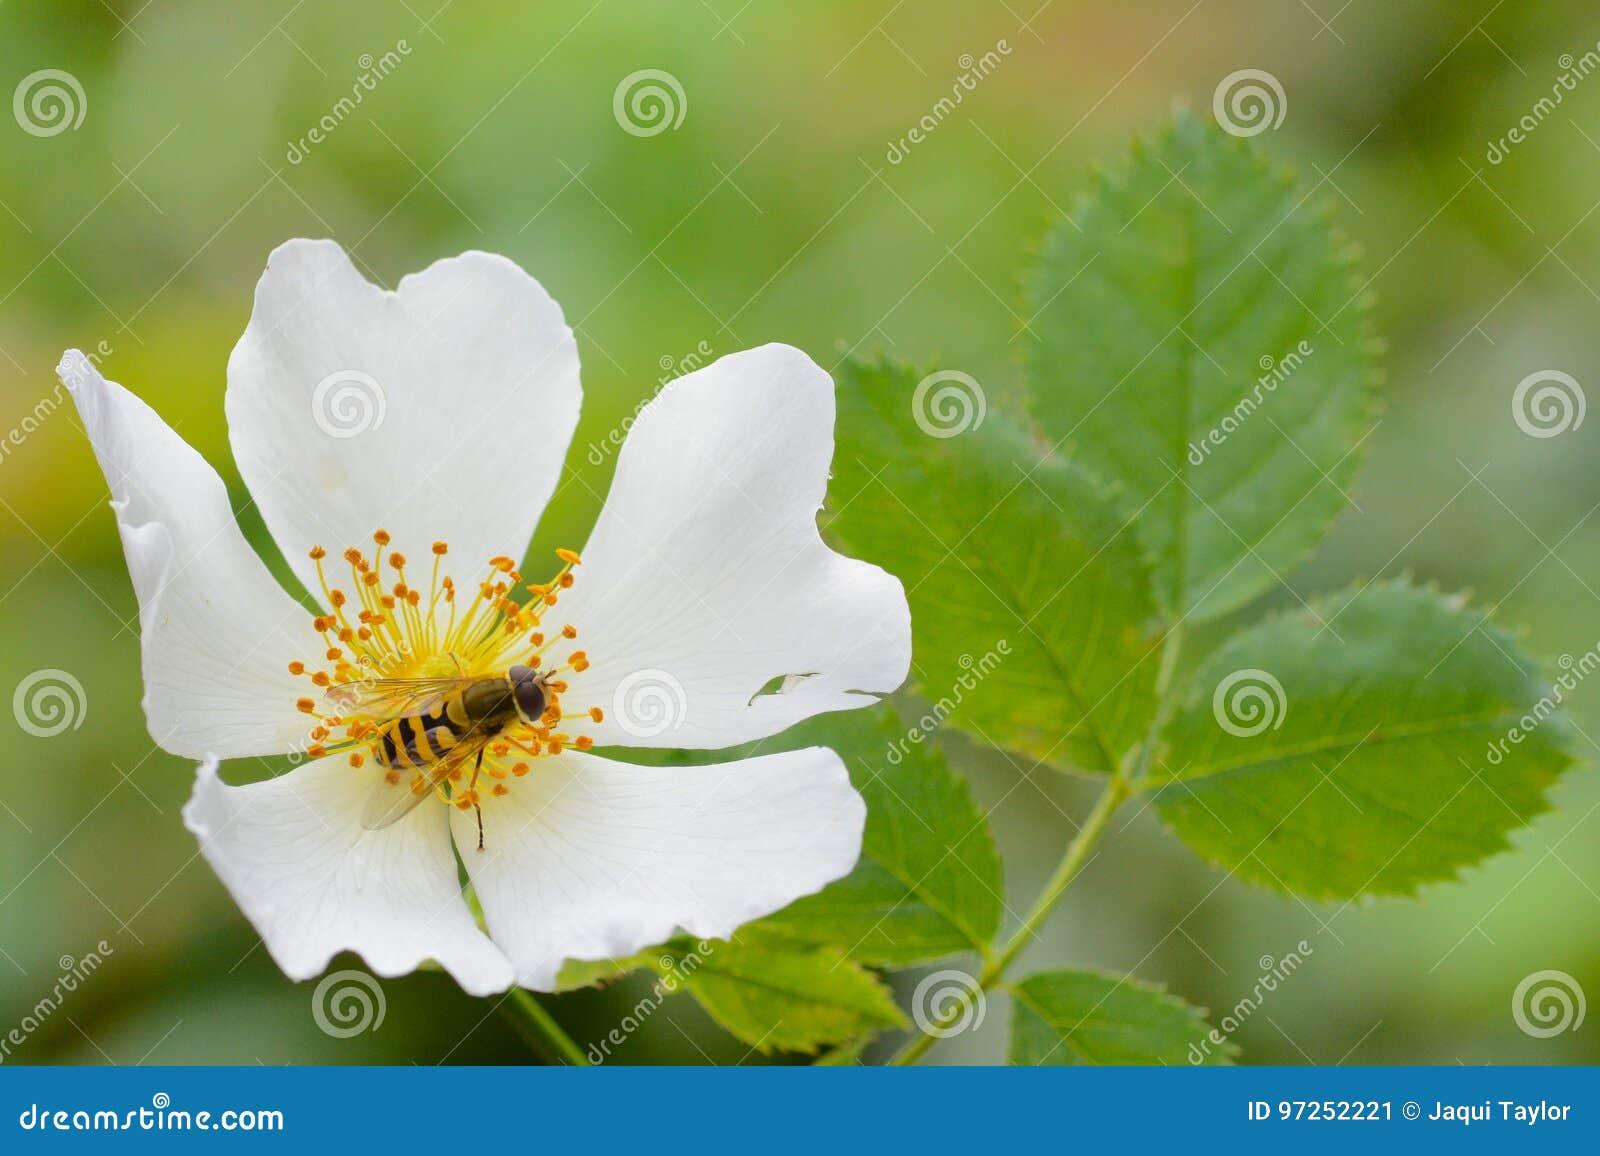 A white climbing rose